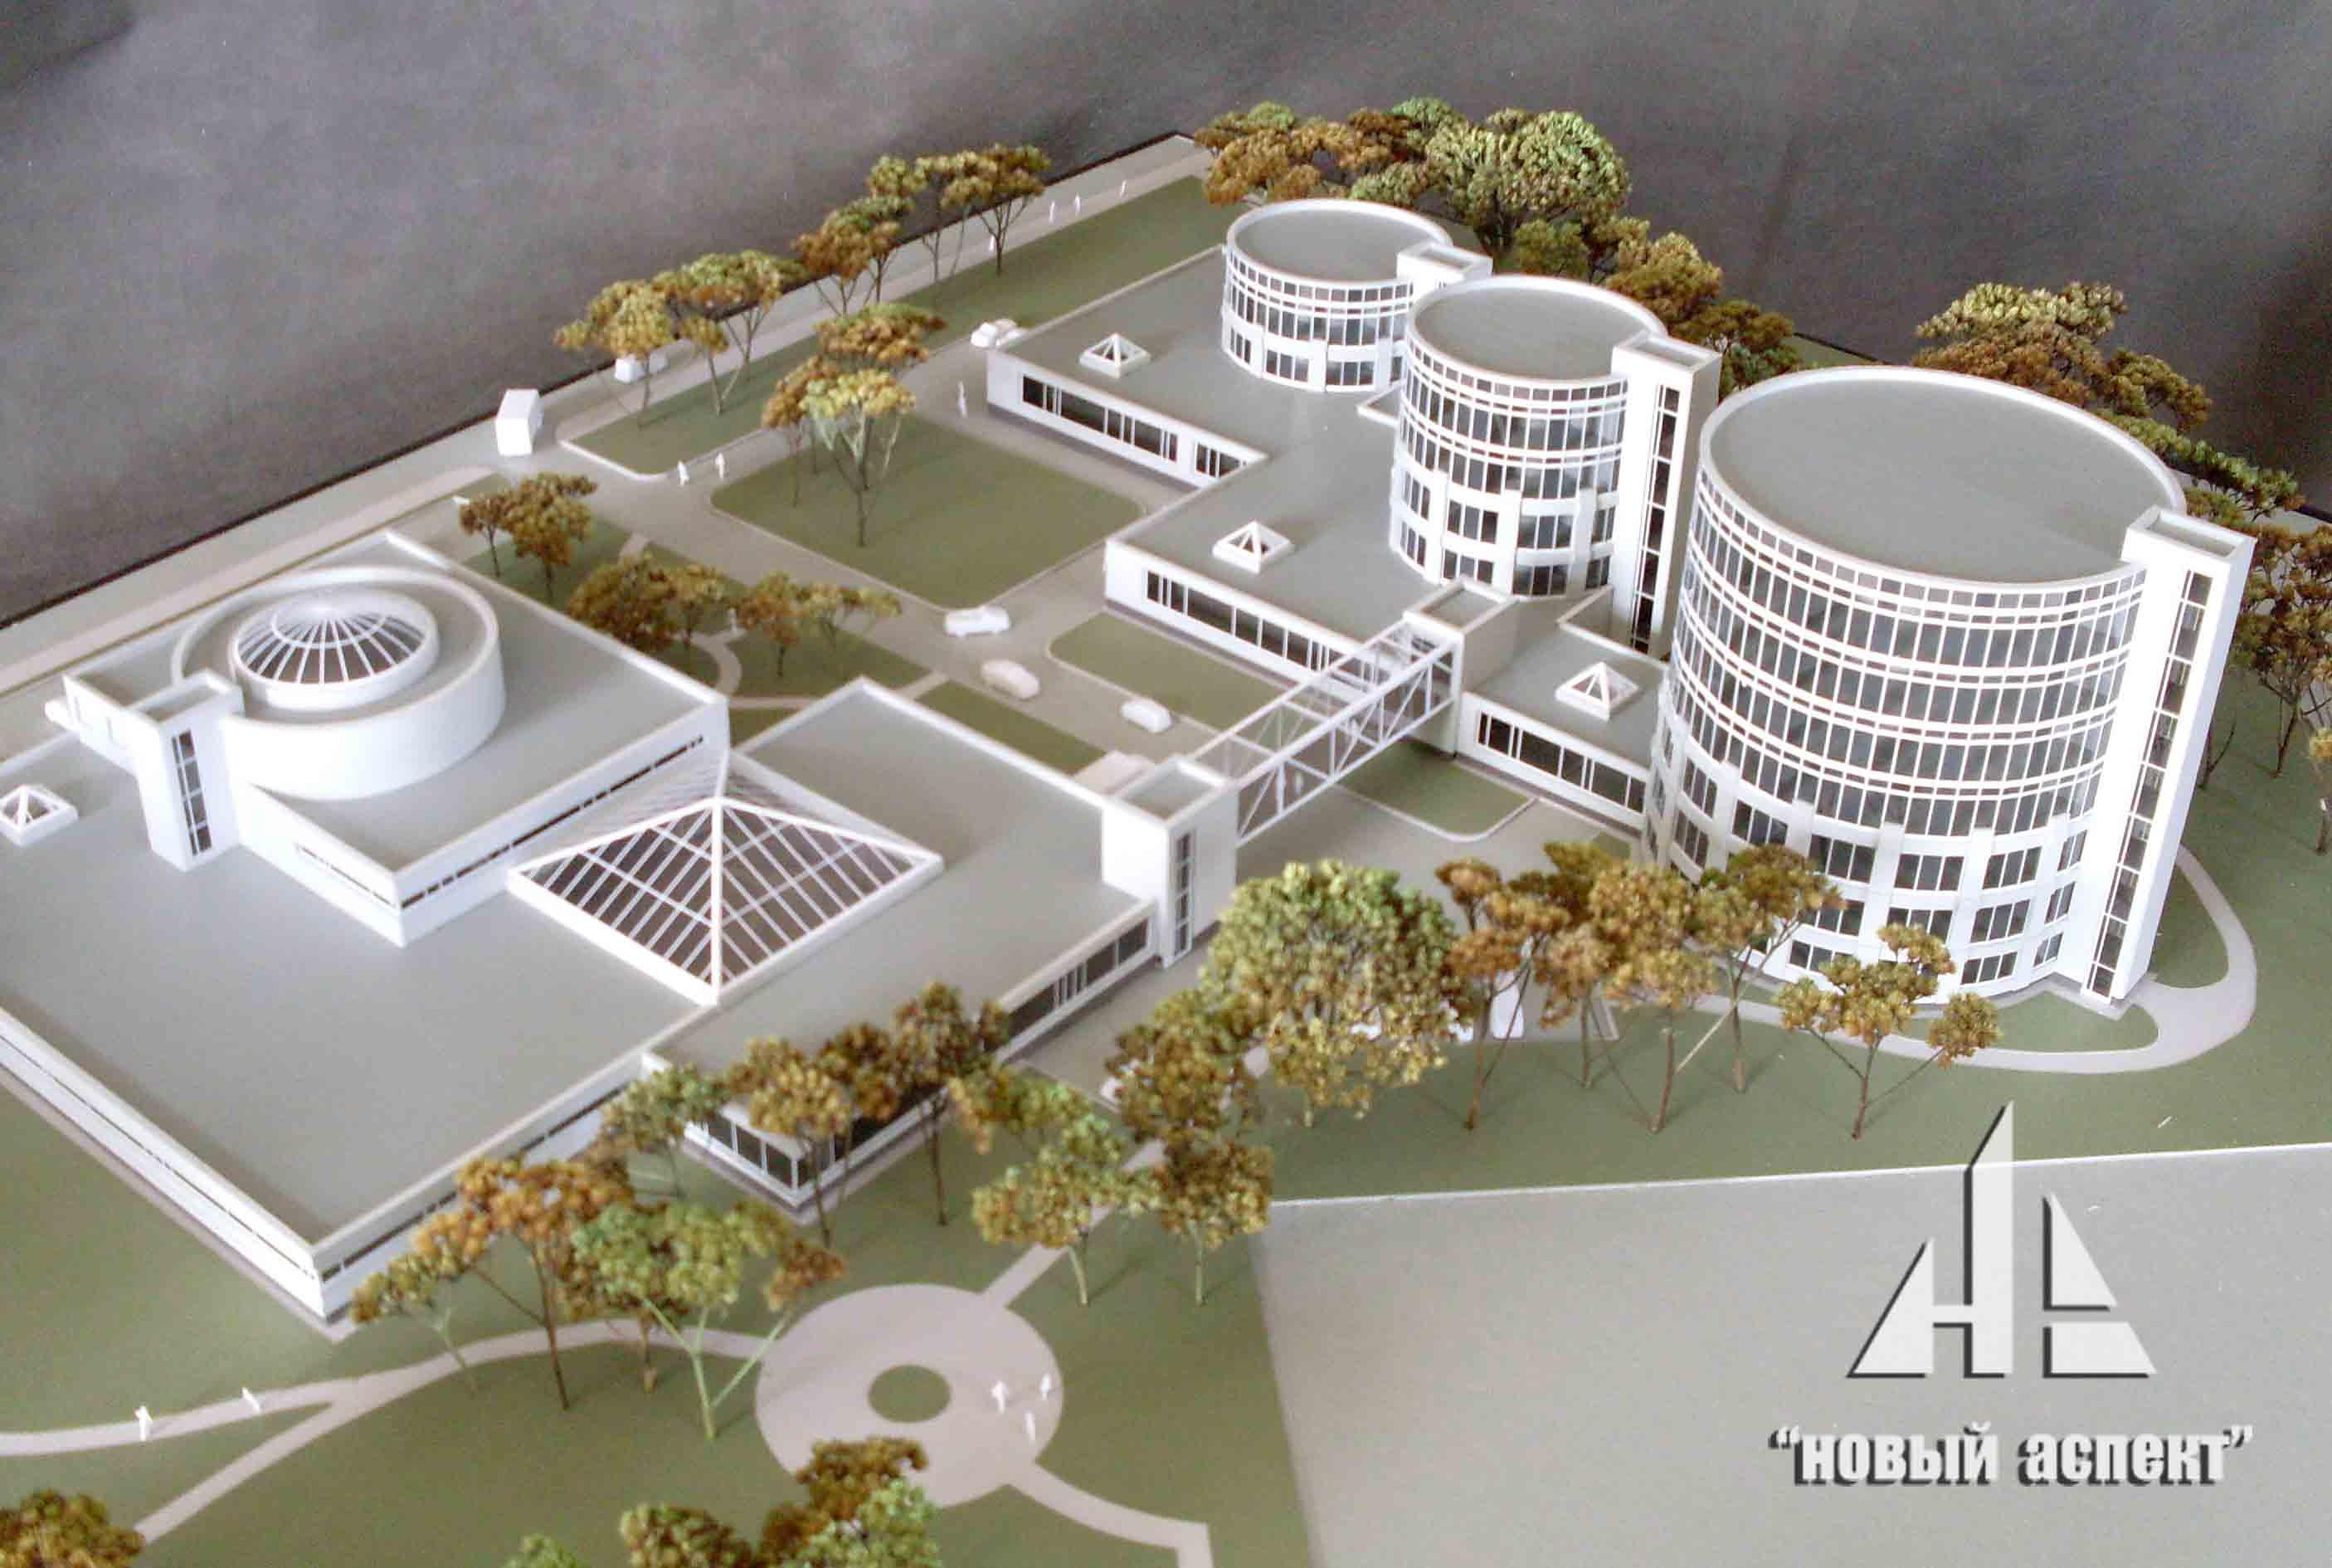 Макеты общественных зданий Медцентр (2)